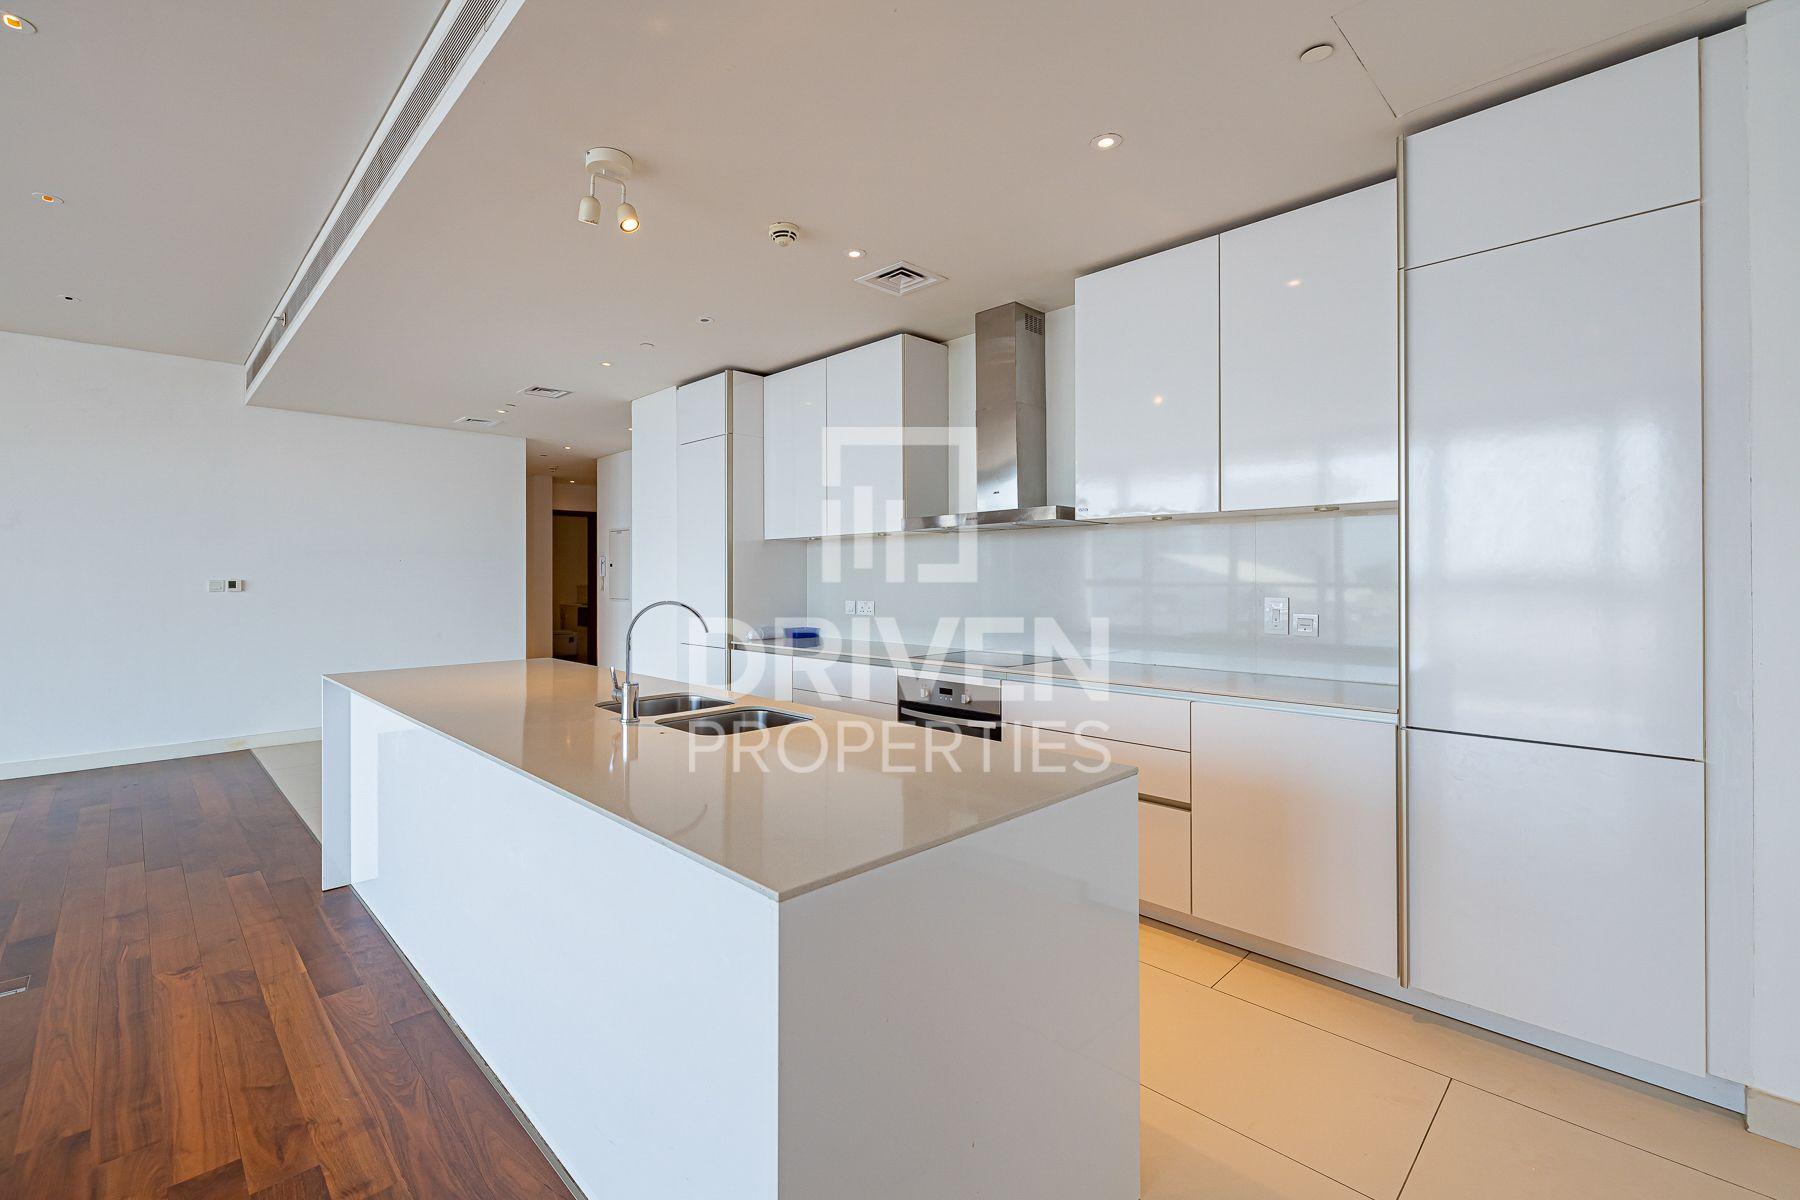 Fully Furnished| Huge Balcony| Cozy Set Up